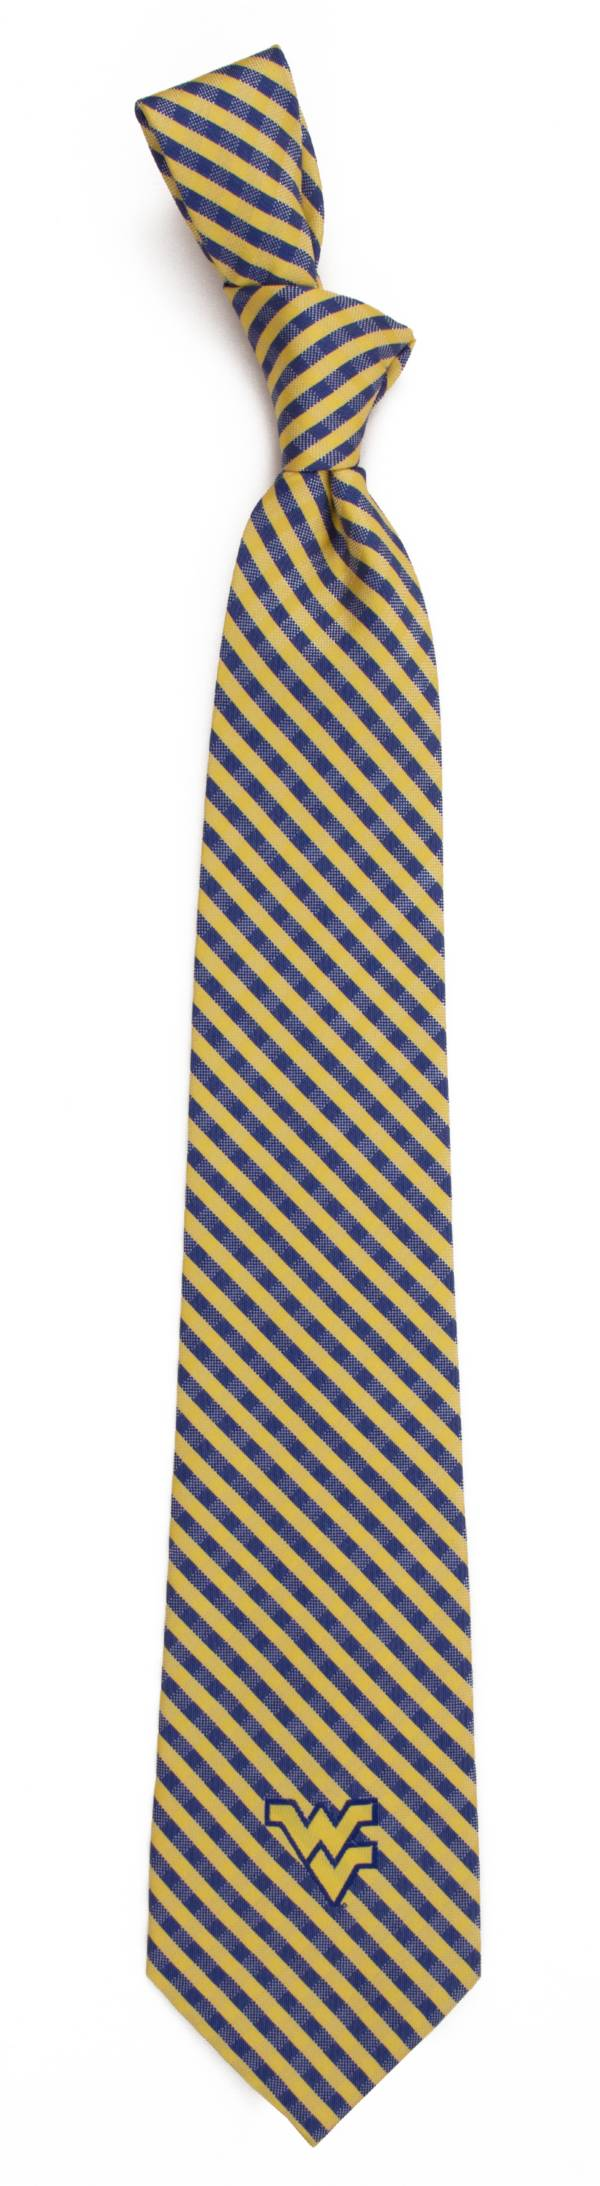 Eagles Wings West Virginia Mountaineers Gingham Necktie product image